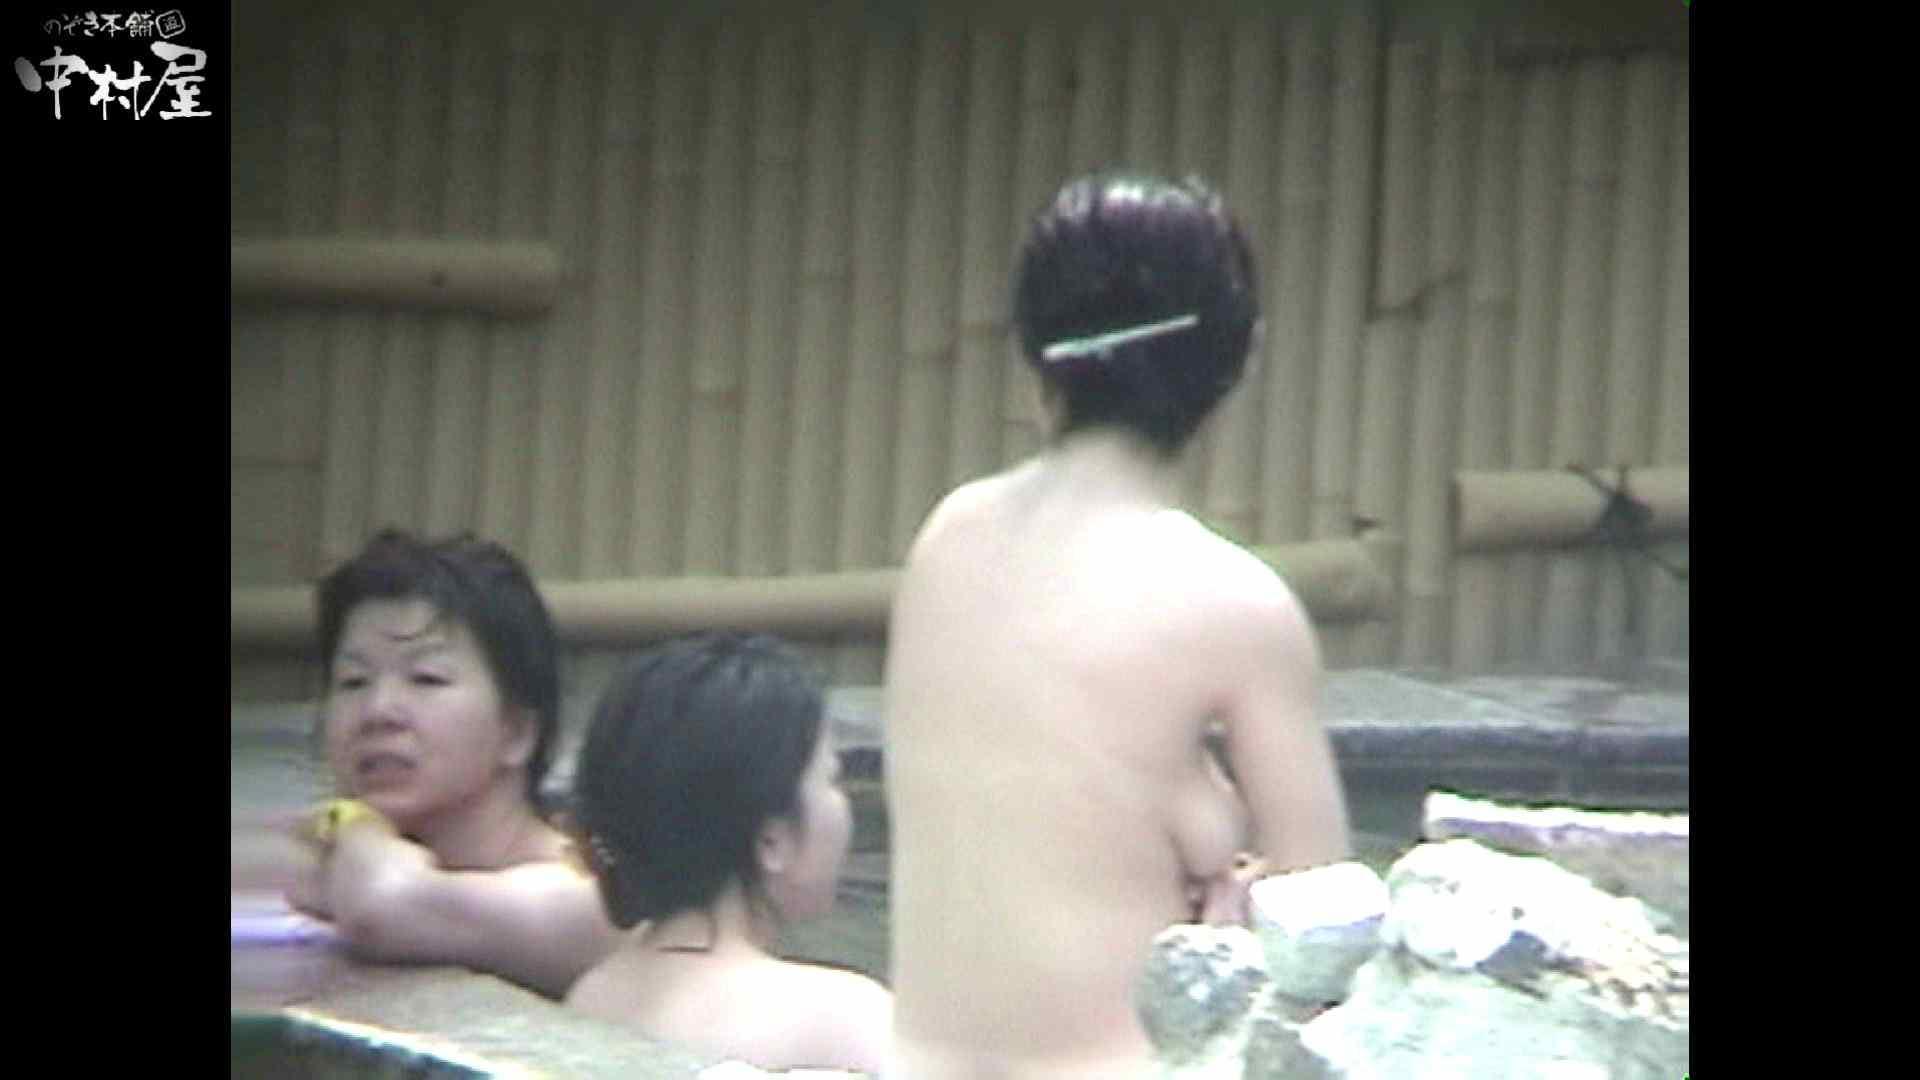 Aquaな露天風呂Vol.936 盗撮映像  110Pix 79